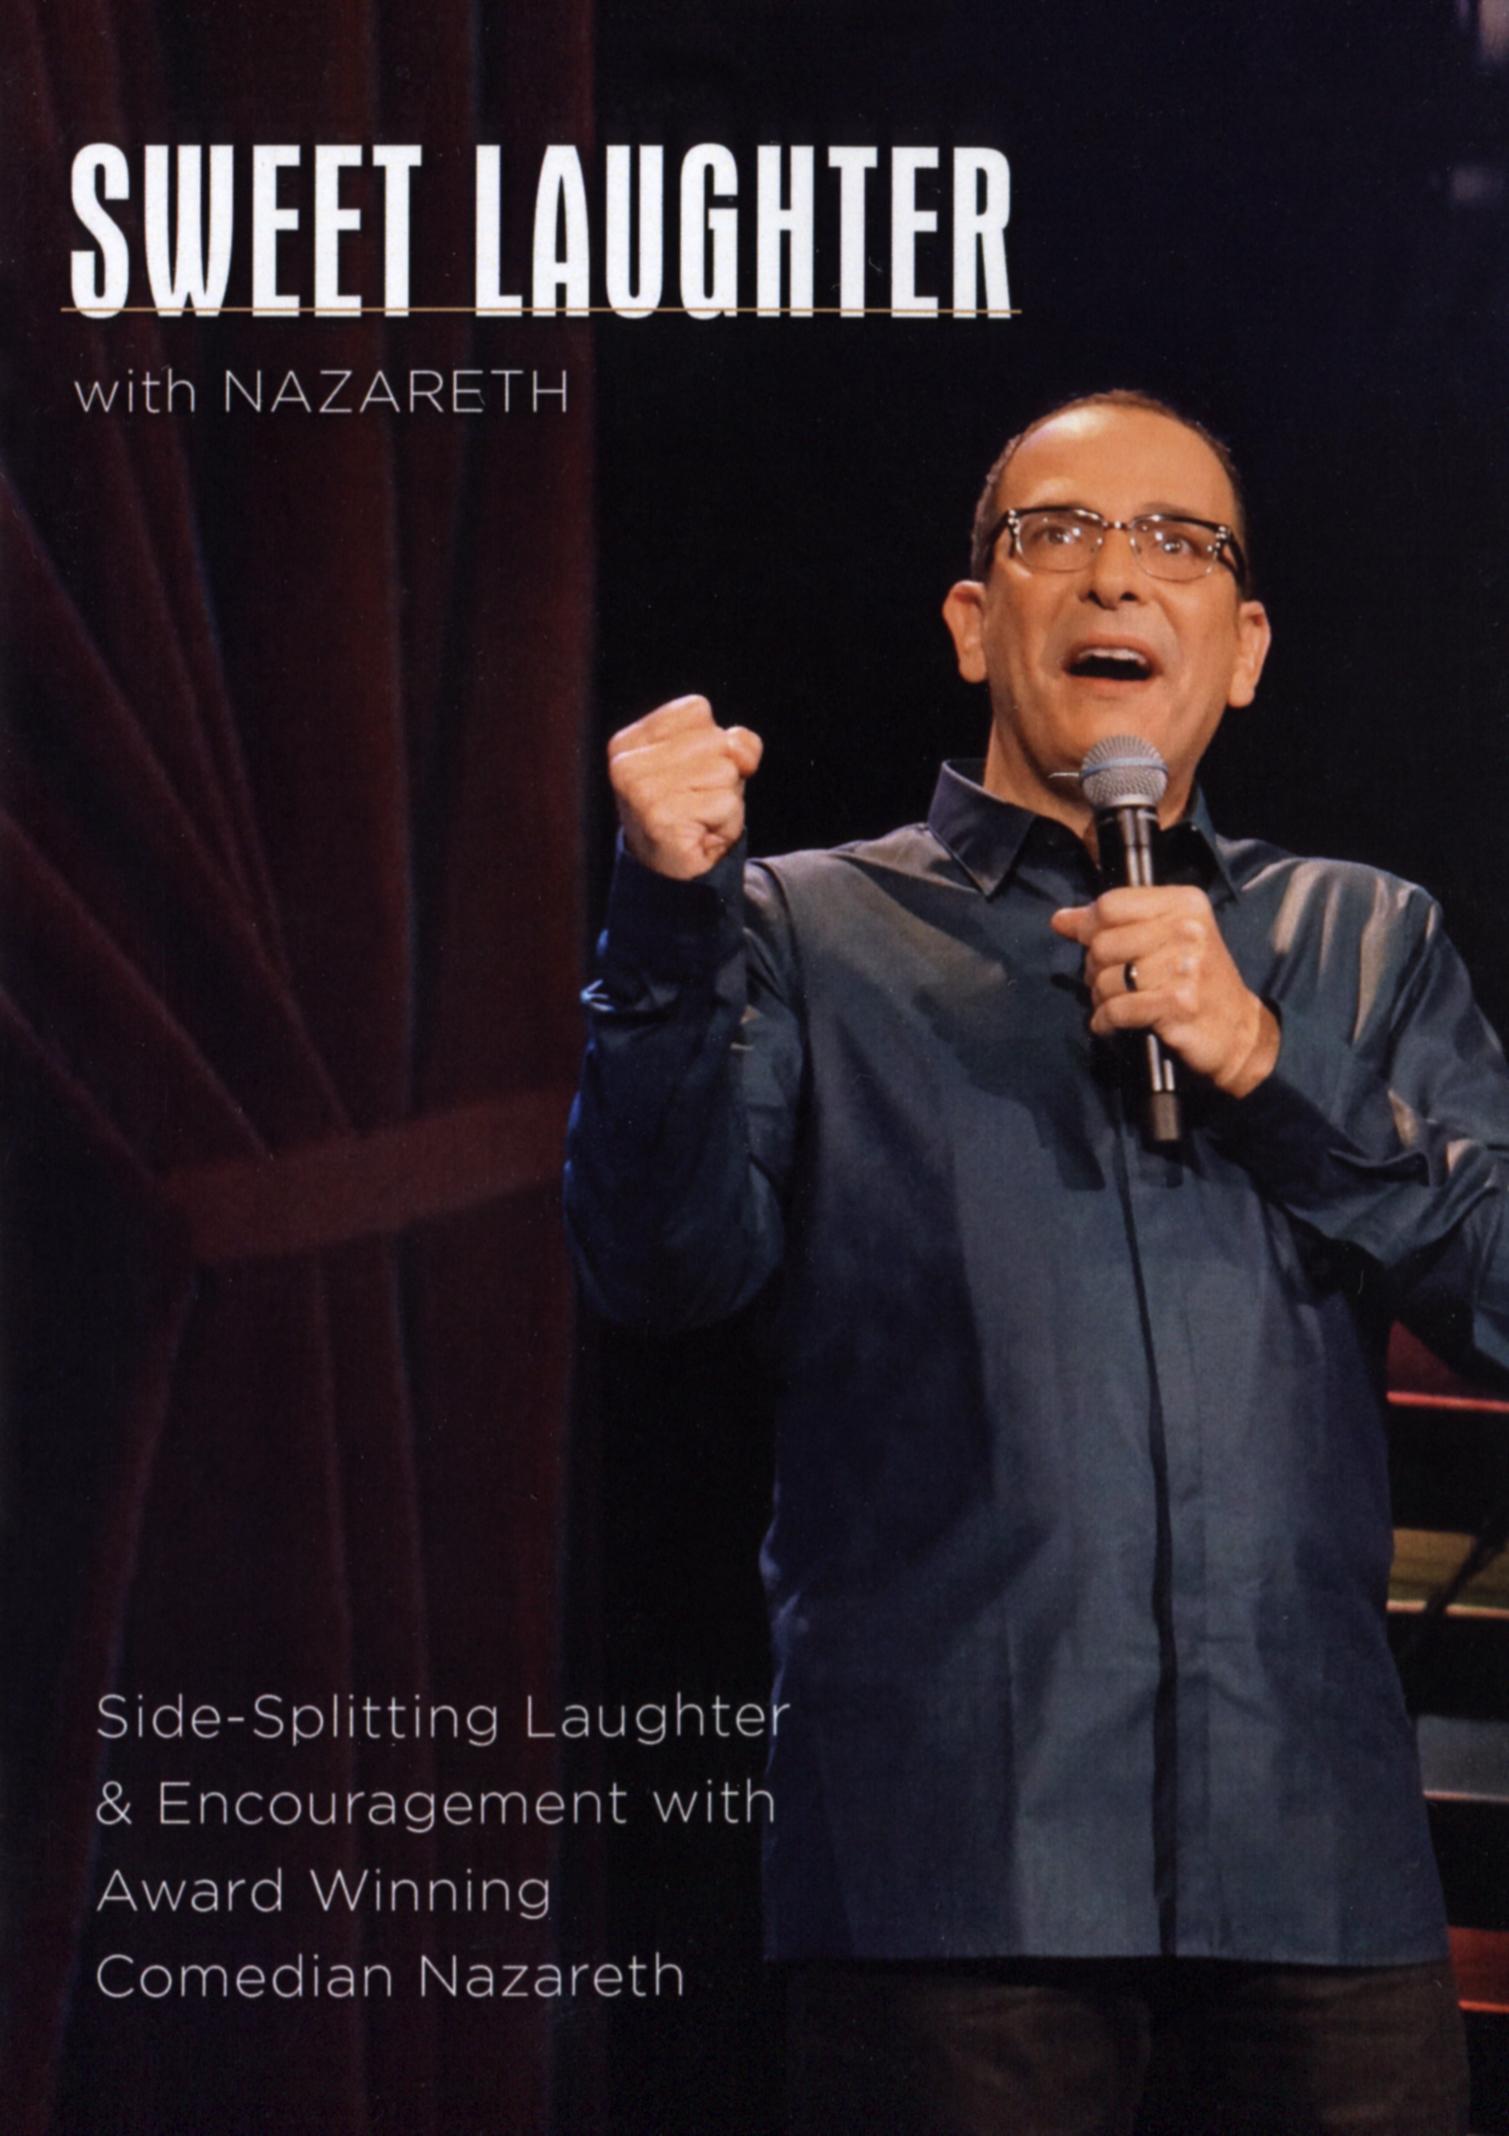 Nazareth: Sweet Laughter